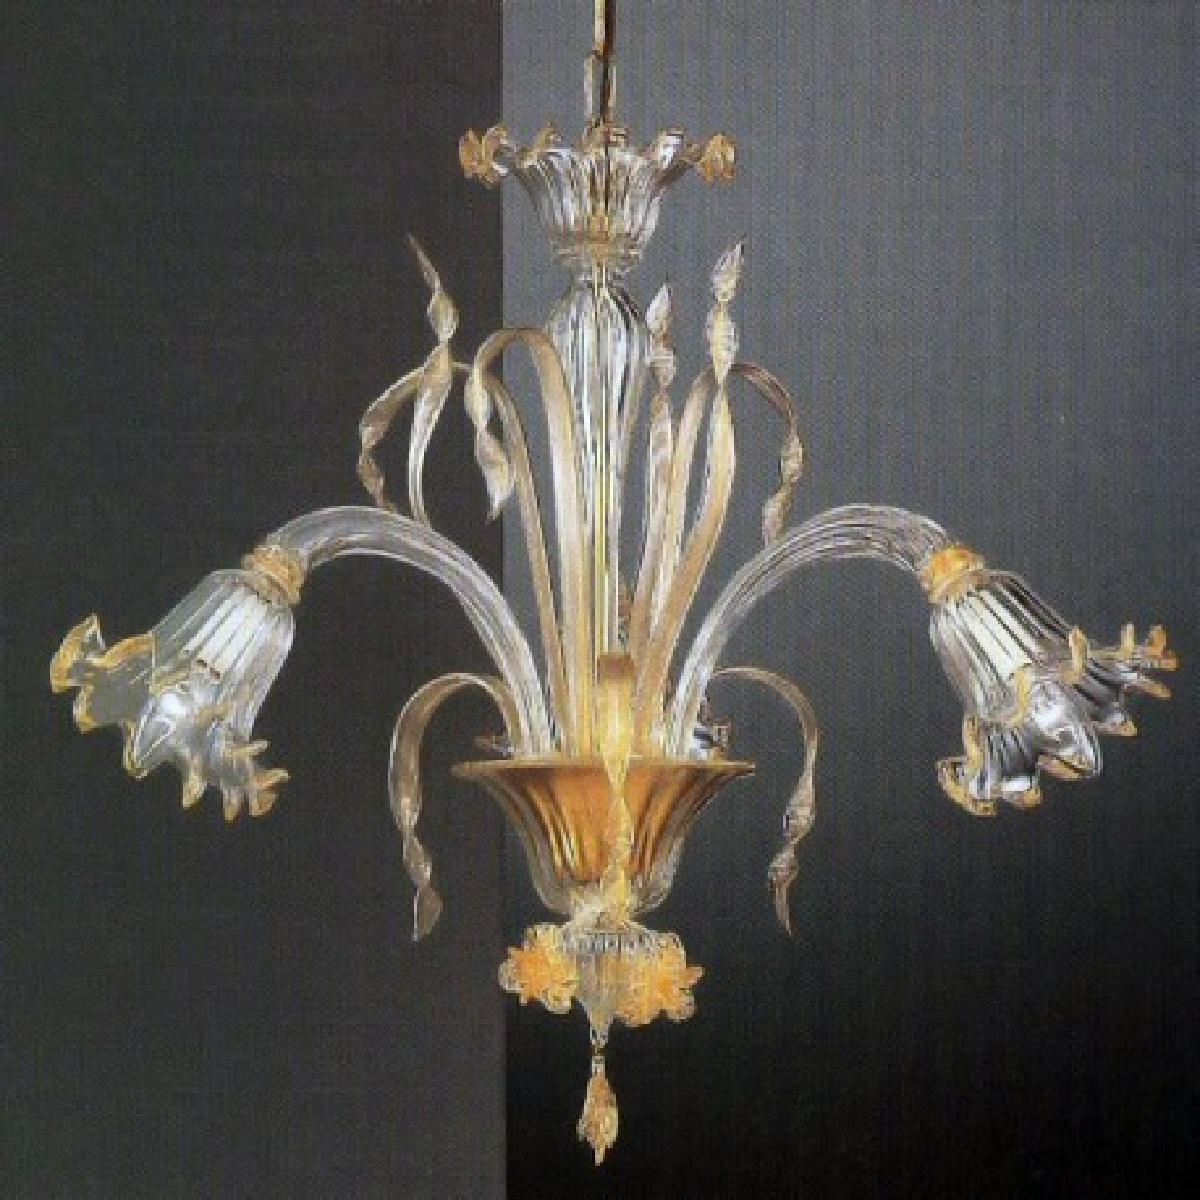 Mori 3 luces lampara de Murano - color transparente oro